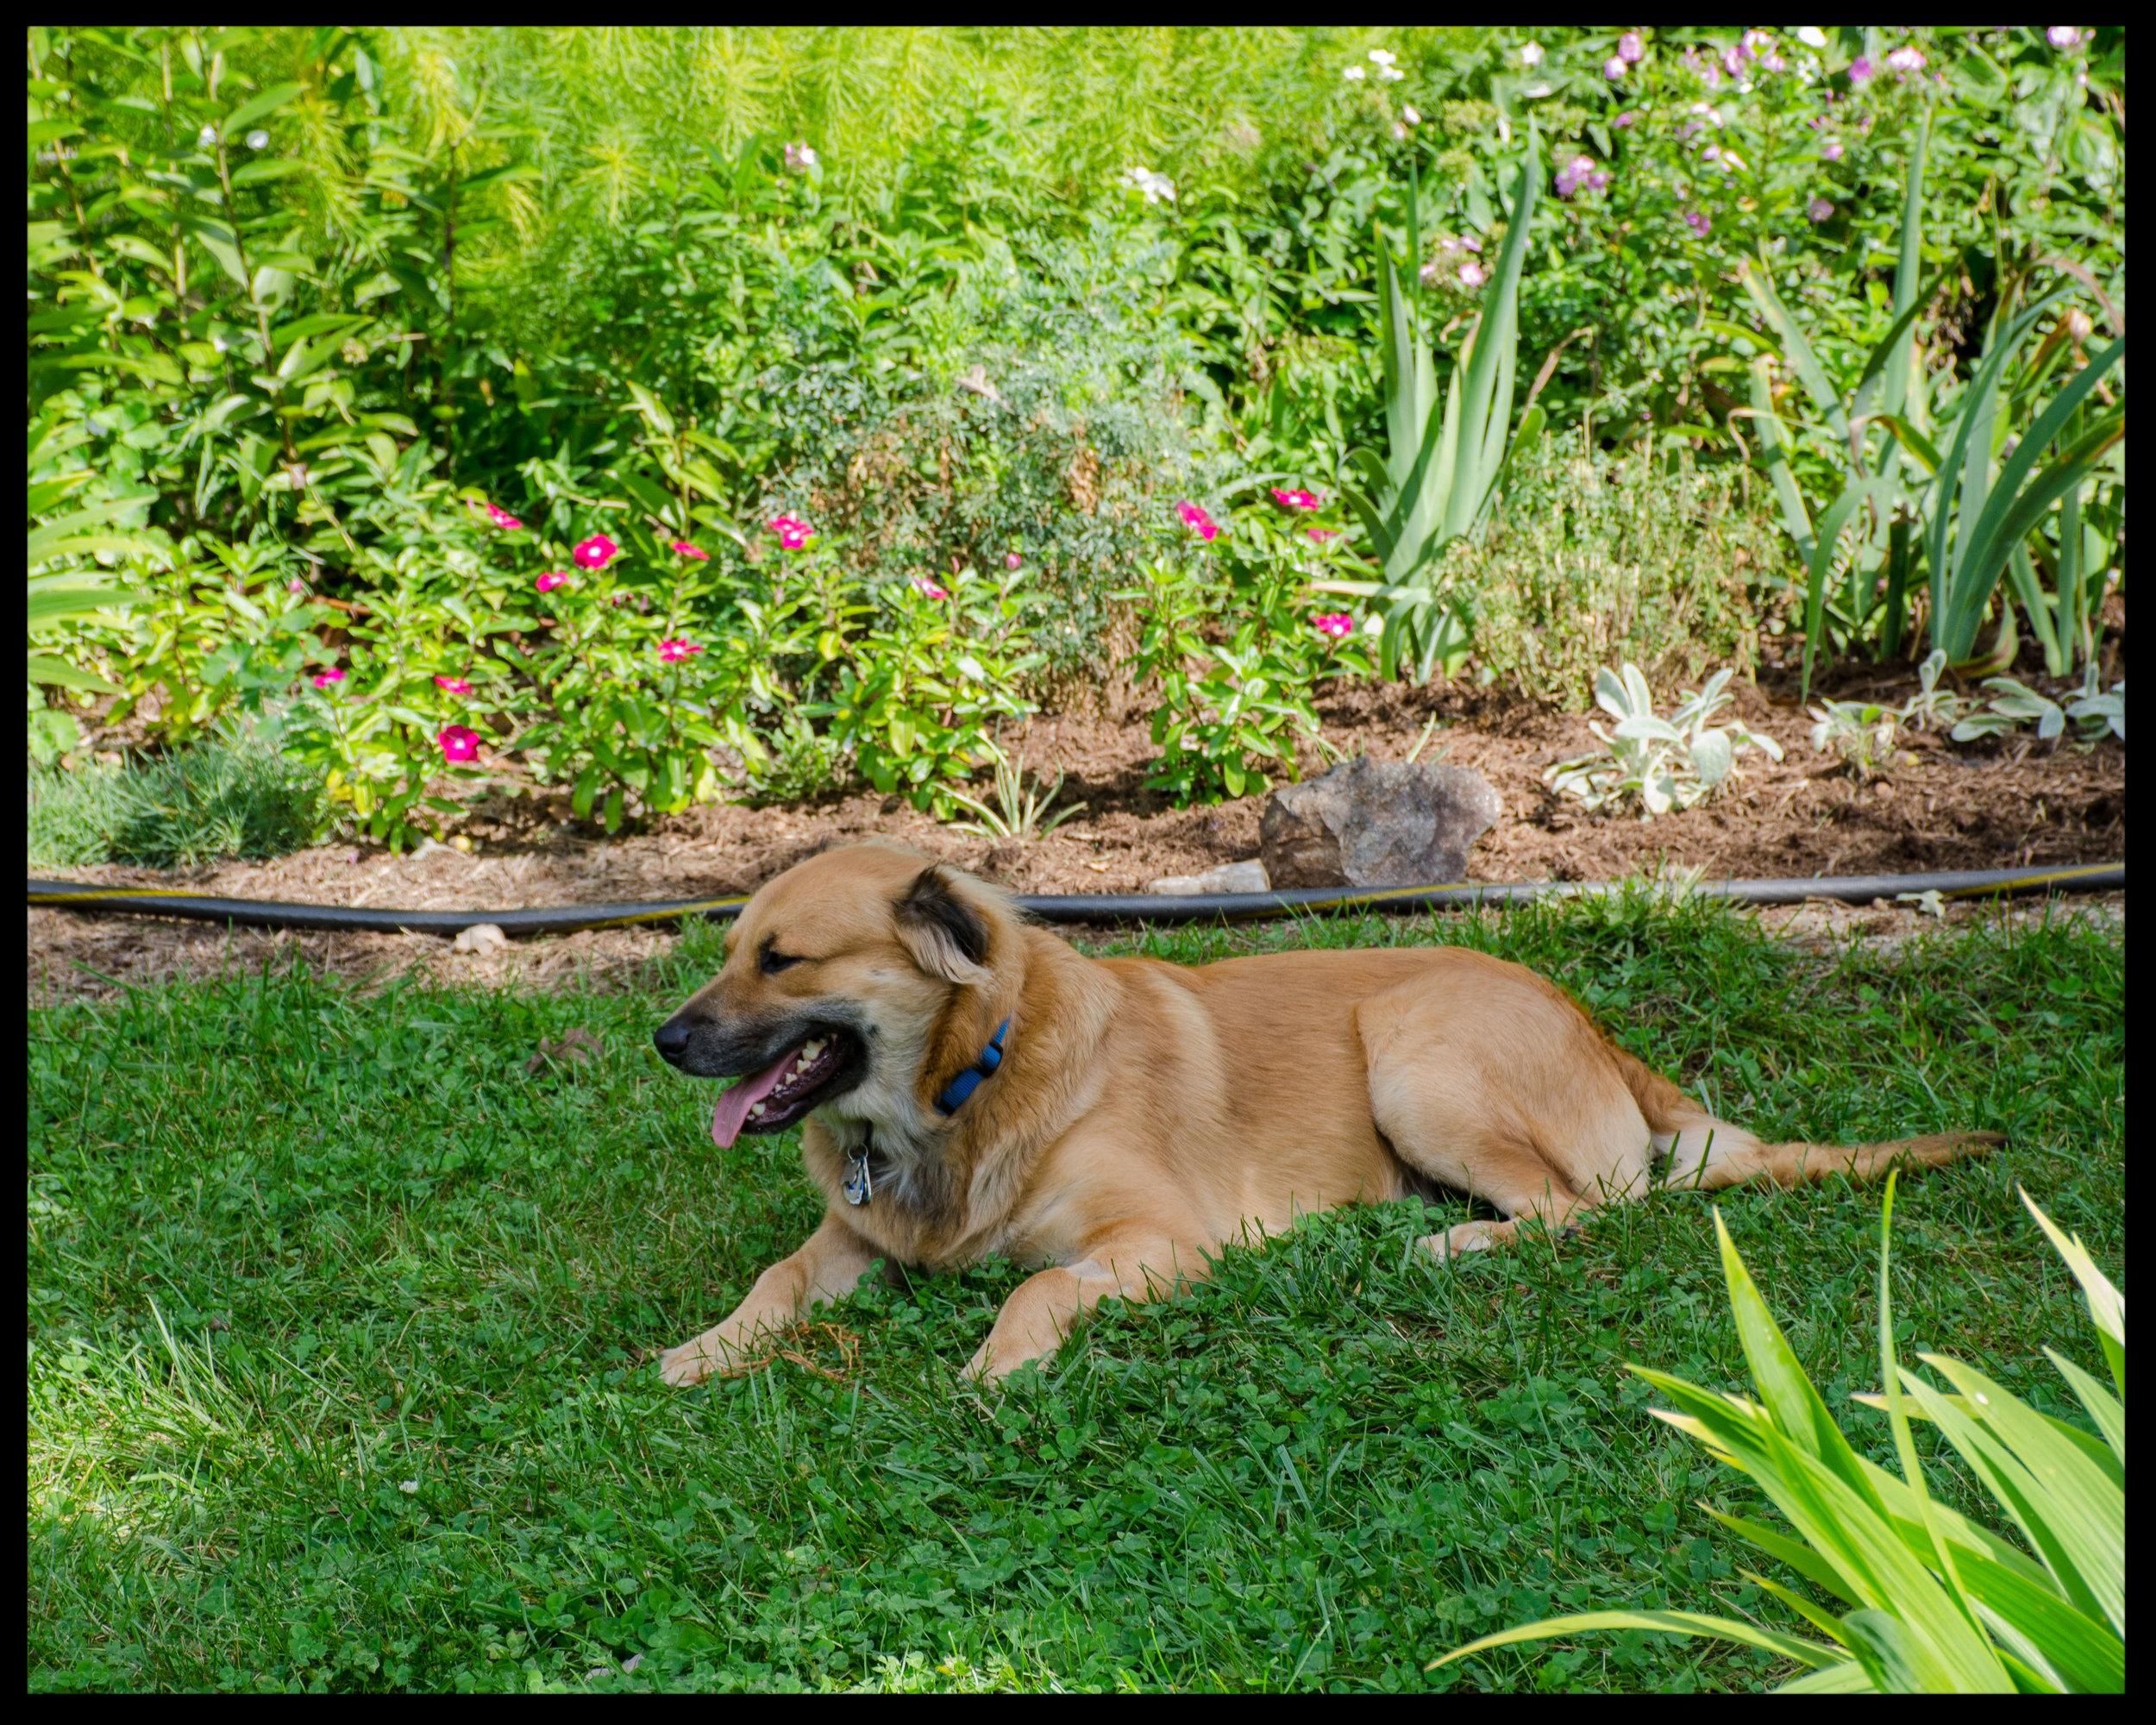 Odin. He's the pupper.